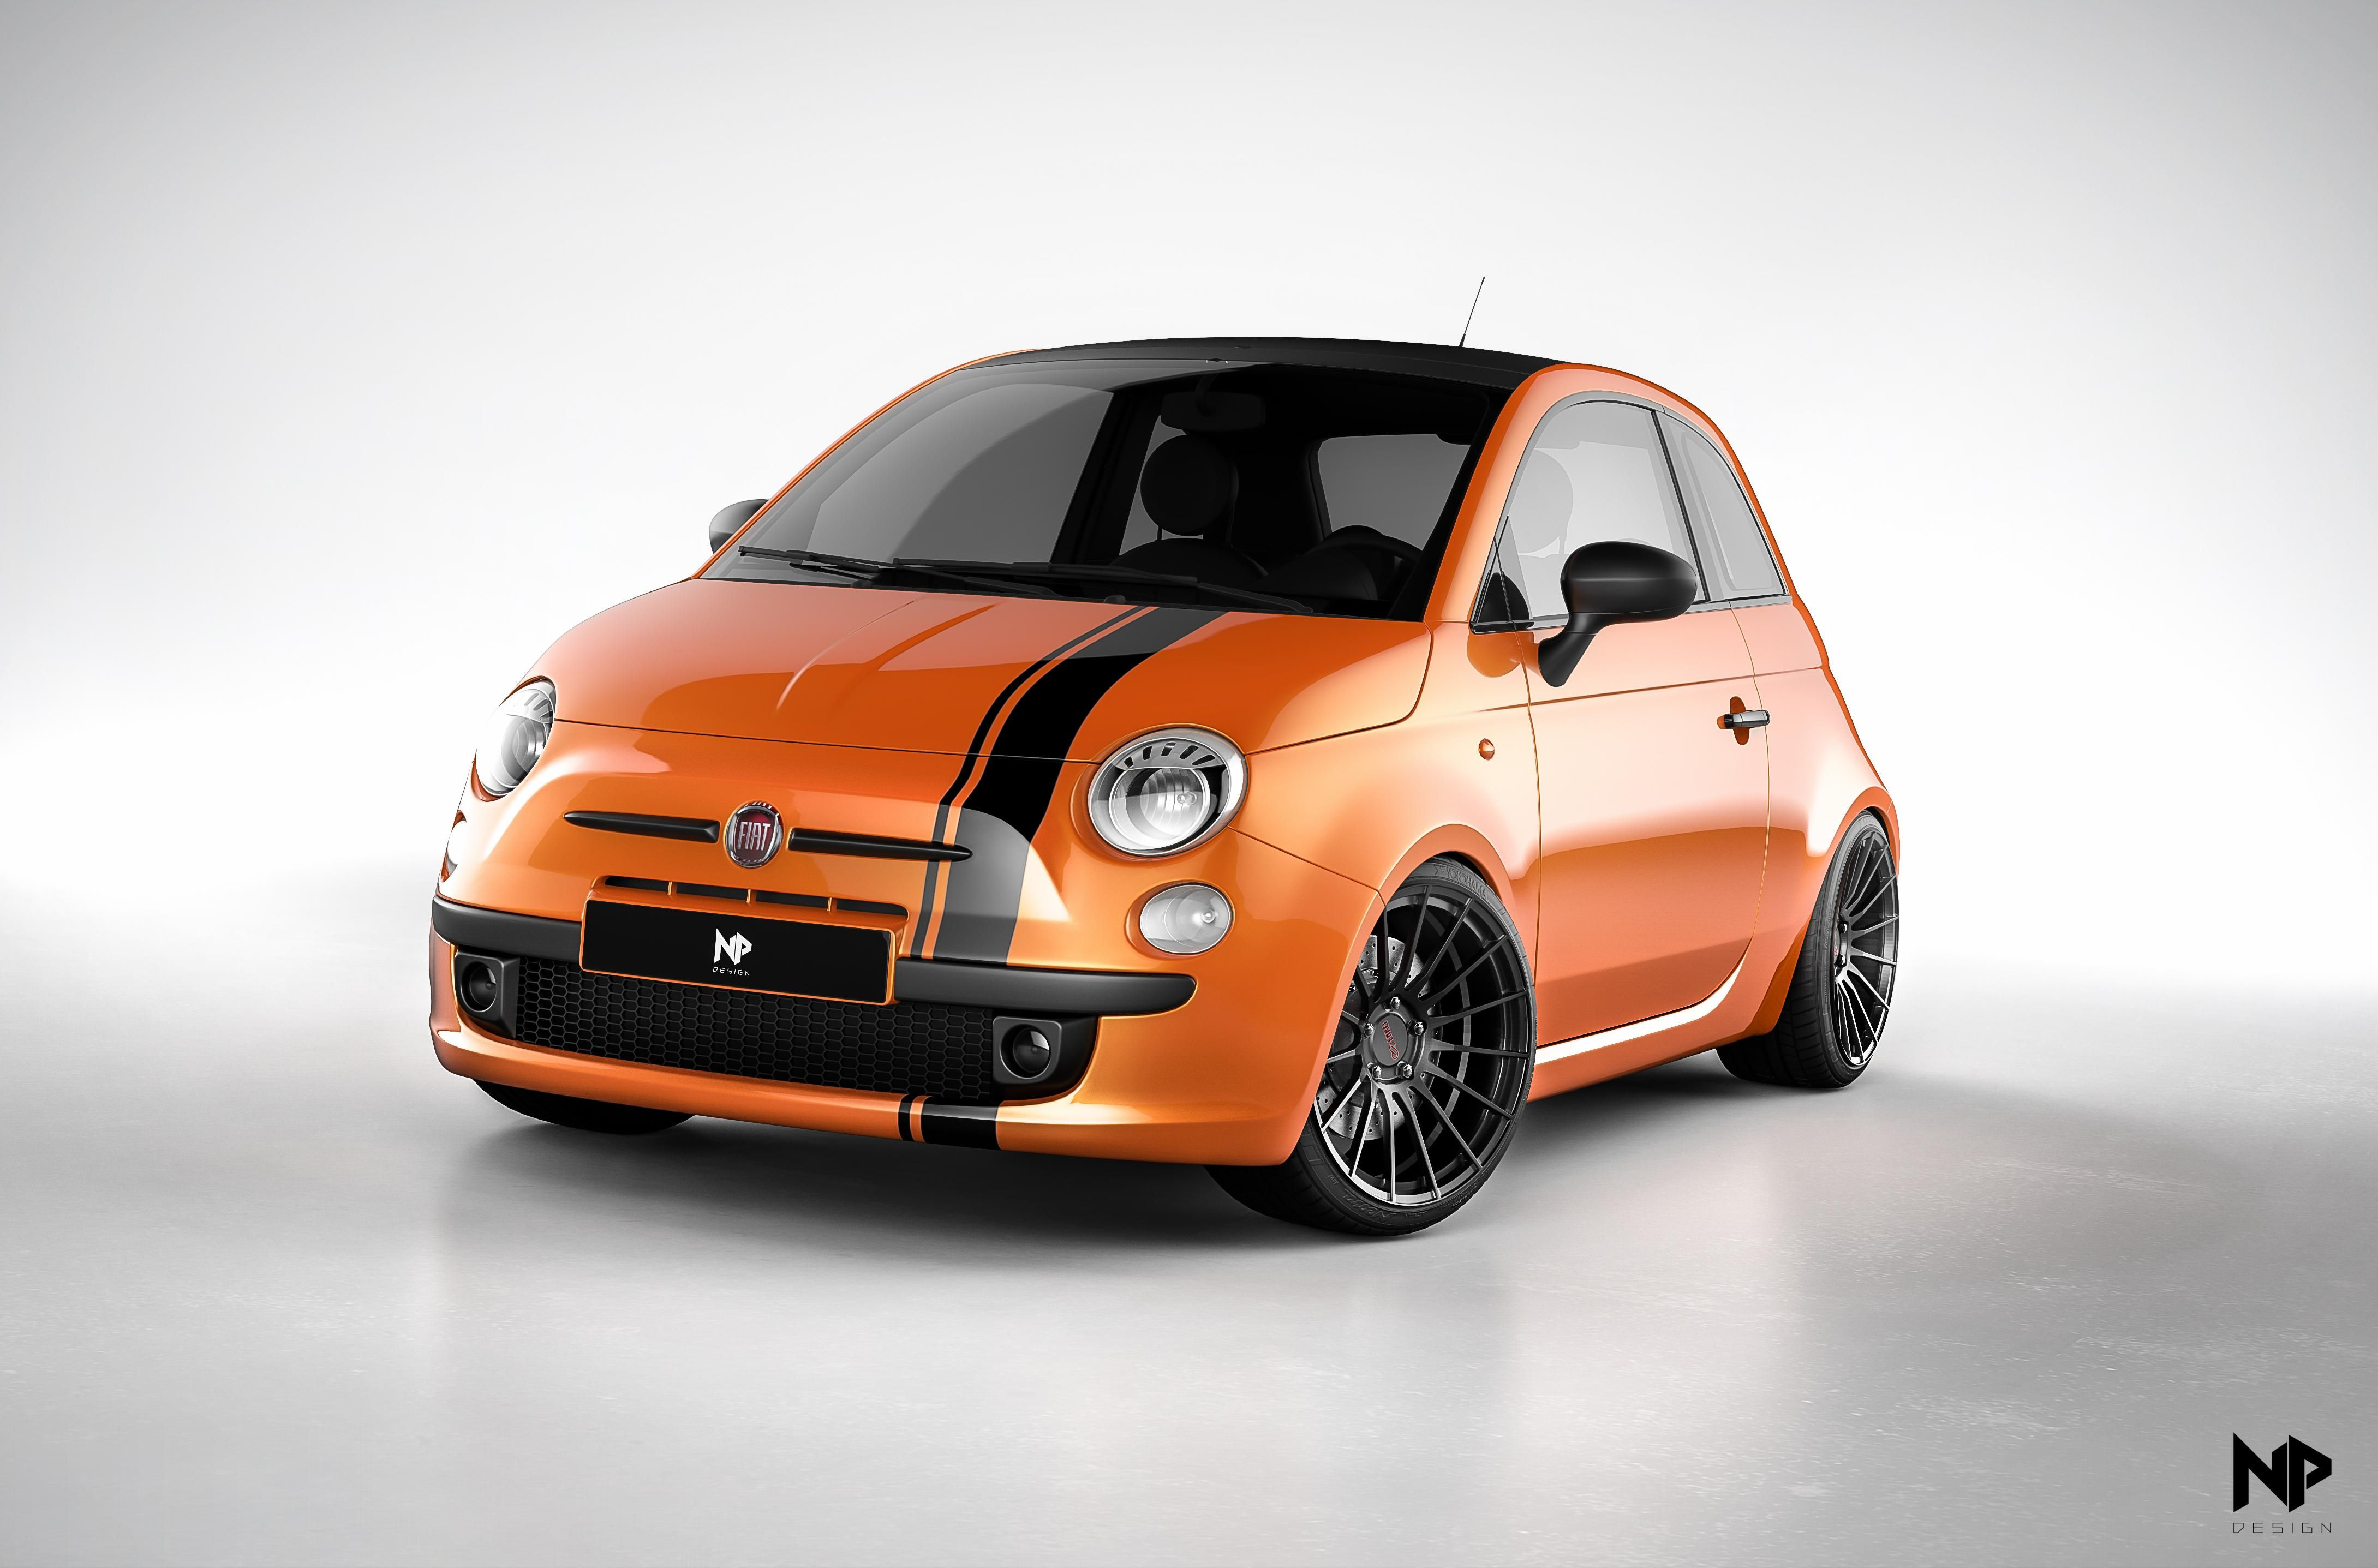 orange stefan edition fiat 500 with enkei rs50rr wheels rendered in keyshot by nils piirma. Black Bedroom Furniture Sets. Home Design Ideas